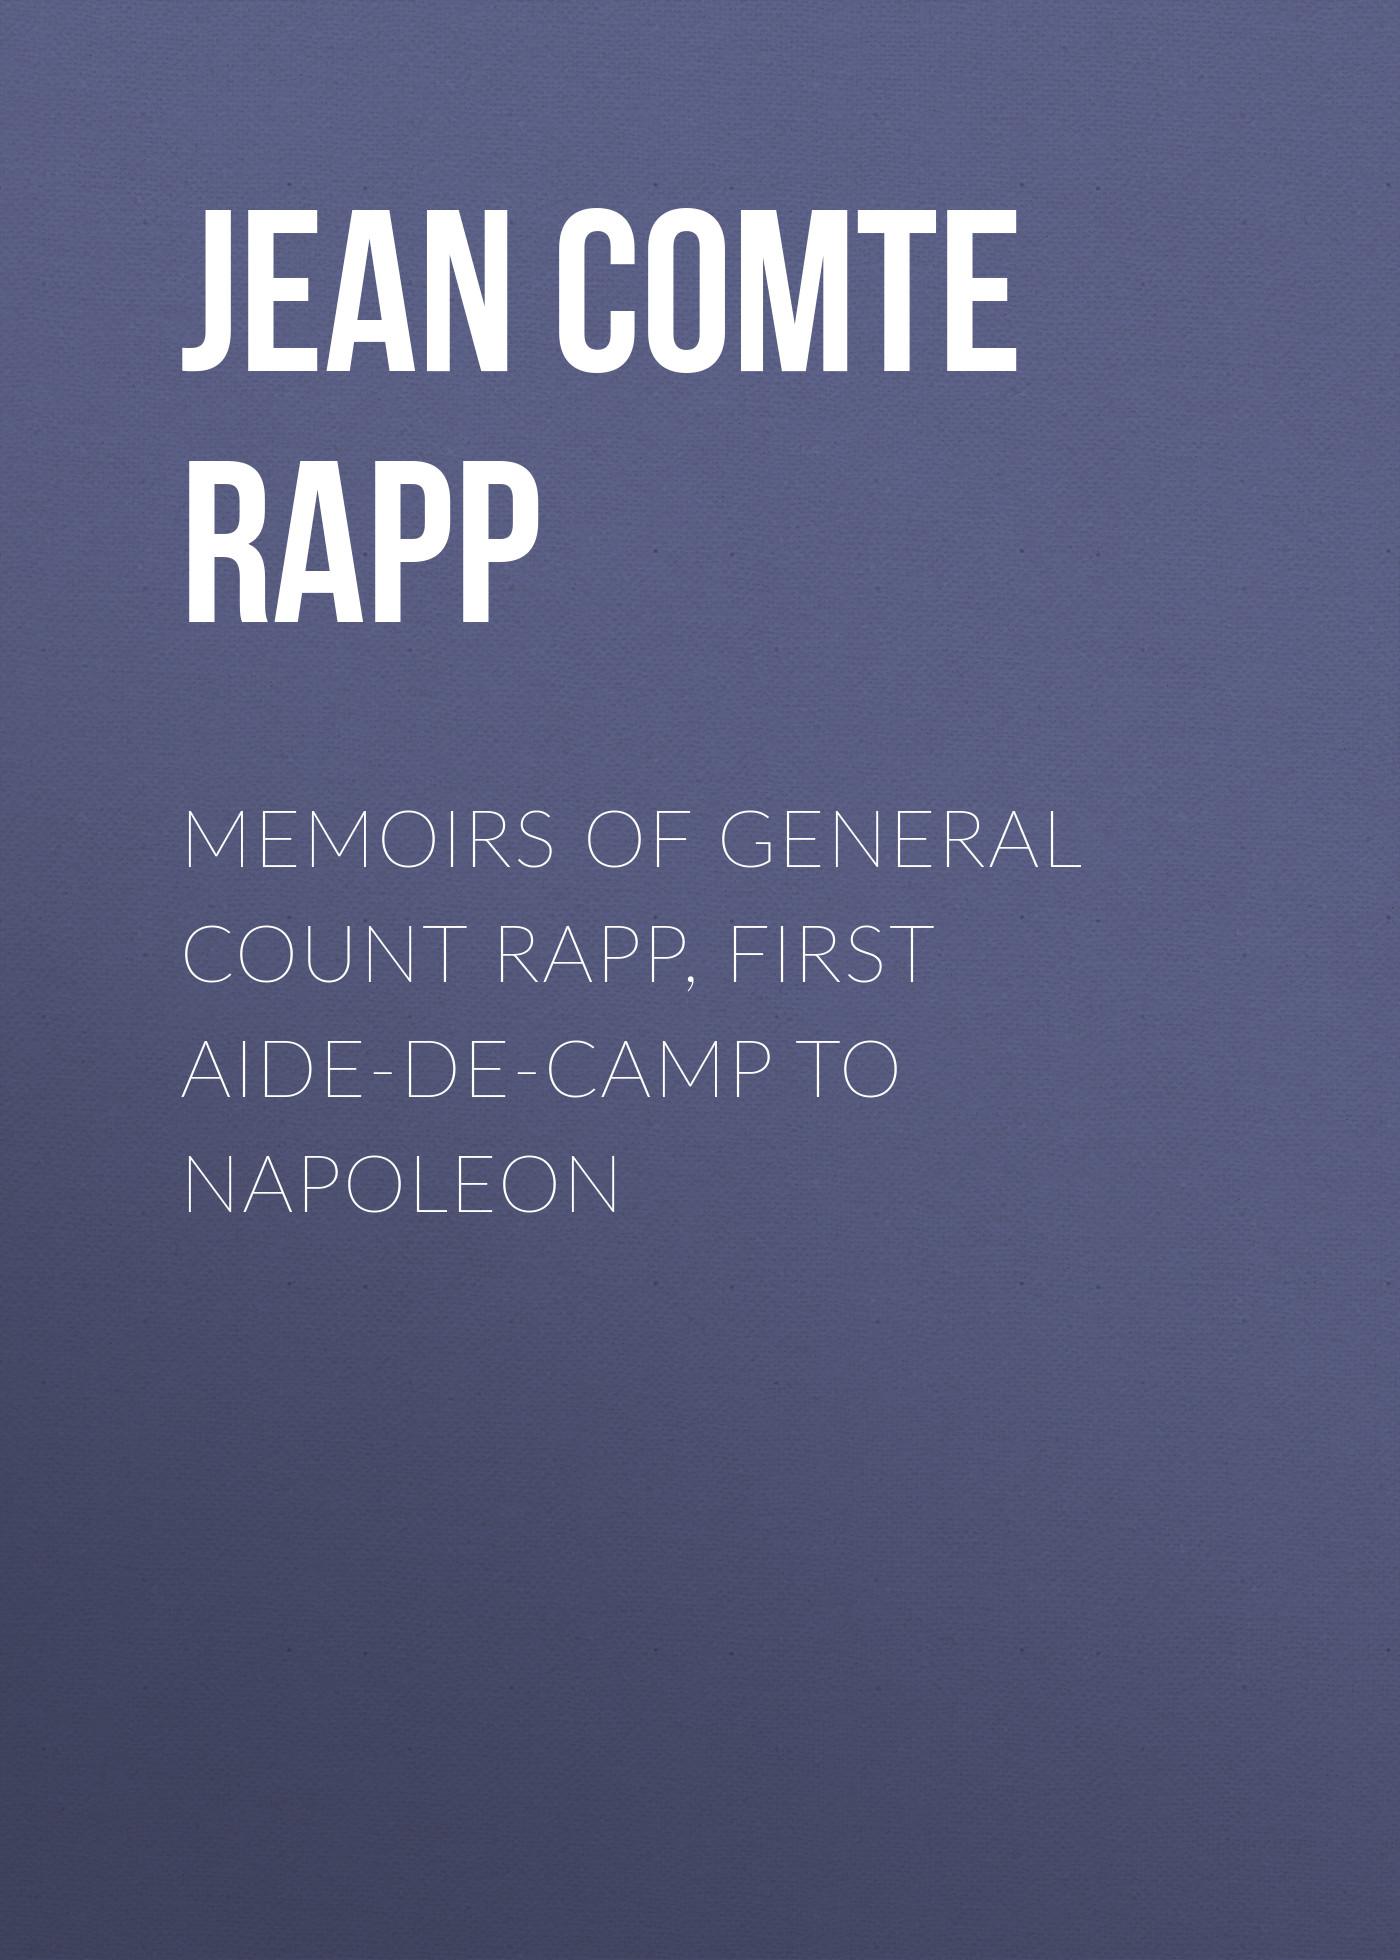 Jean Comte Rapp Memoirs of General Count Rapp, First aide-de-camp to Napoleon цены